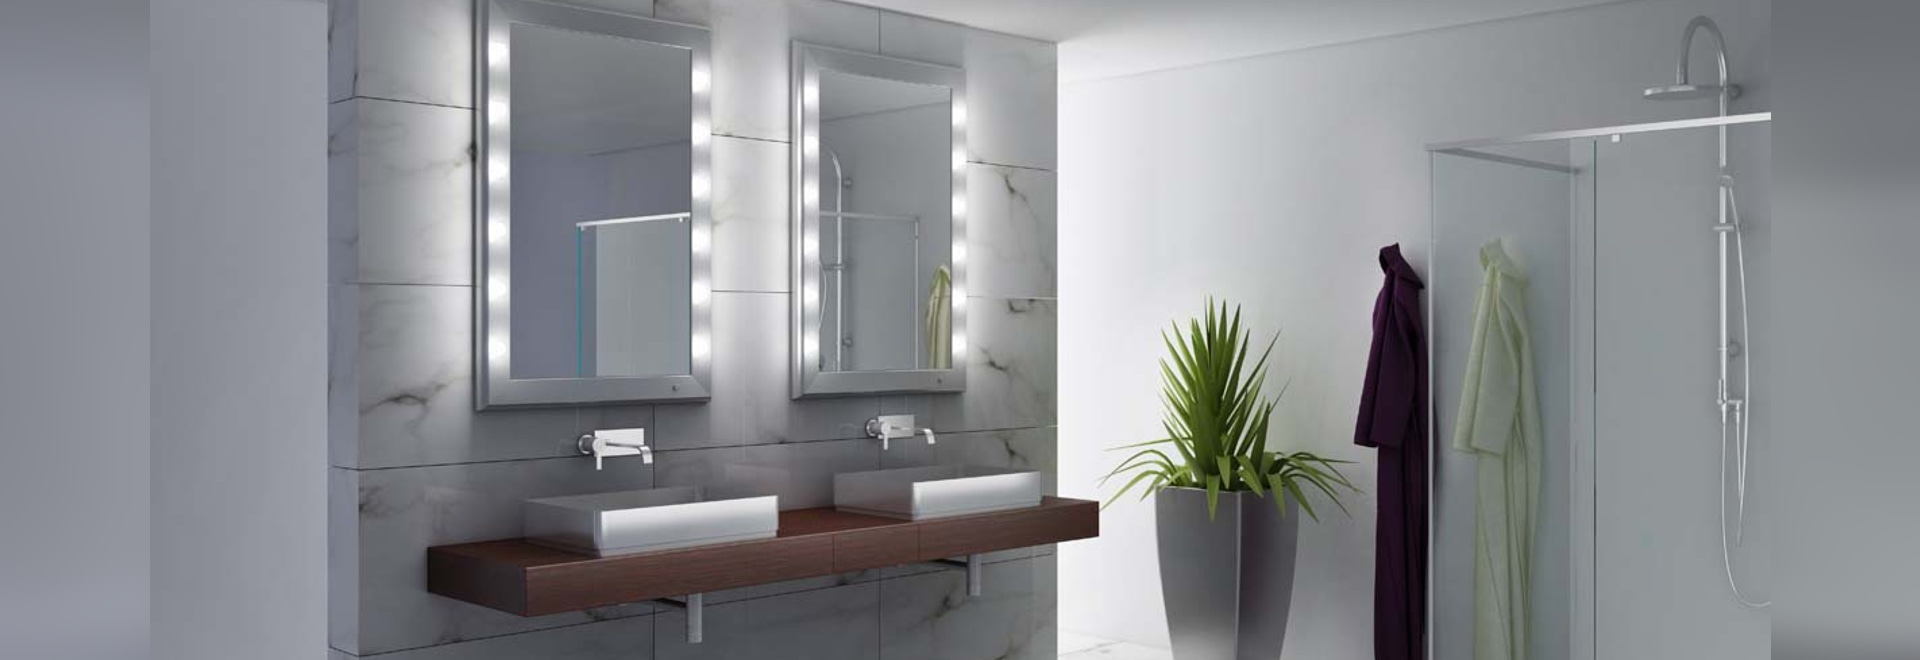 Unica lighted bathroom mirrors